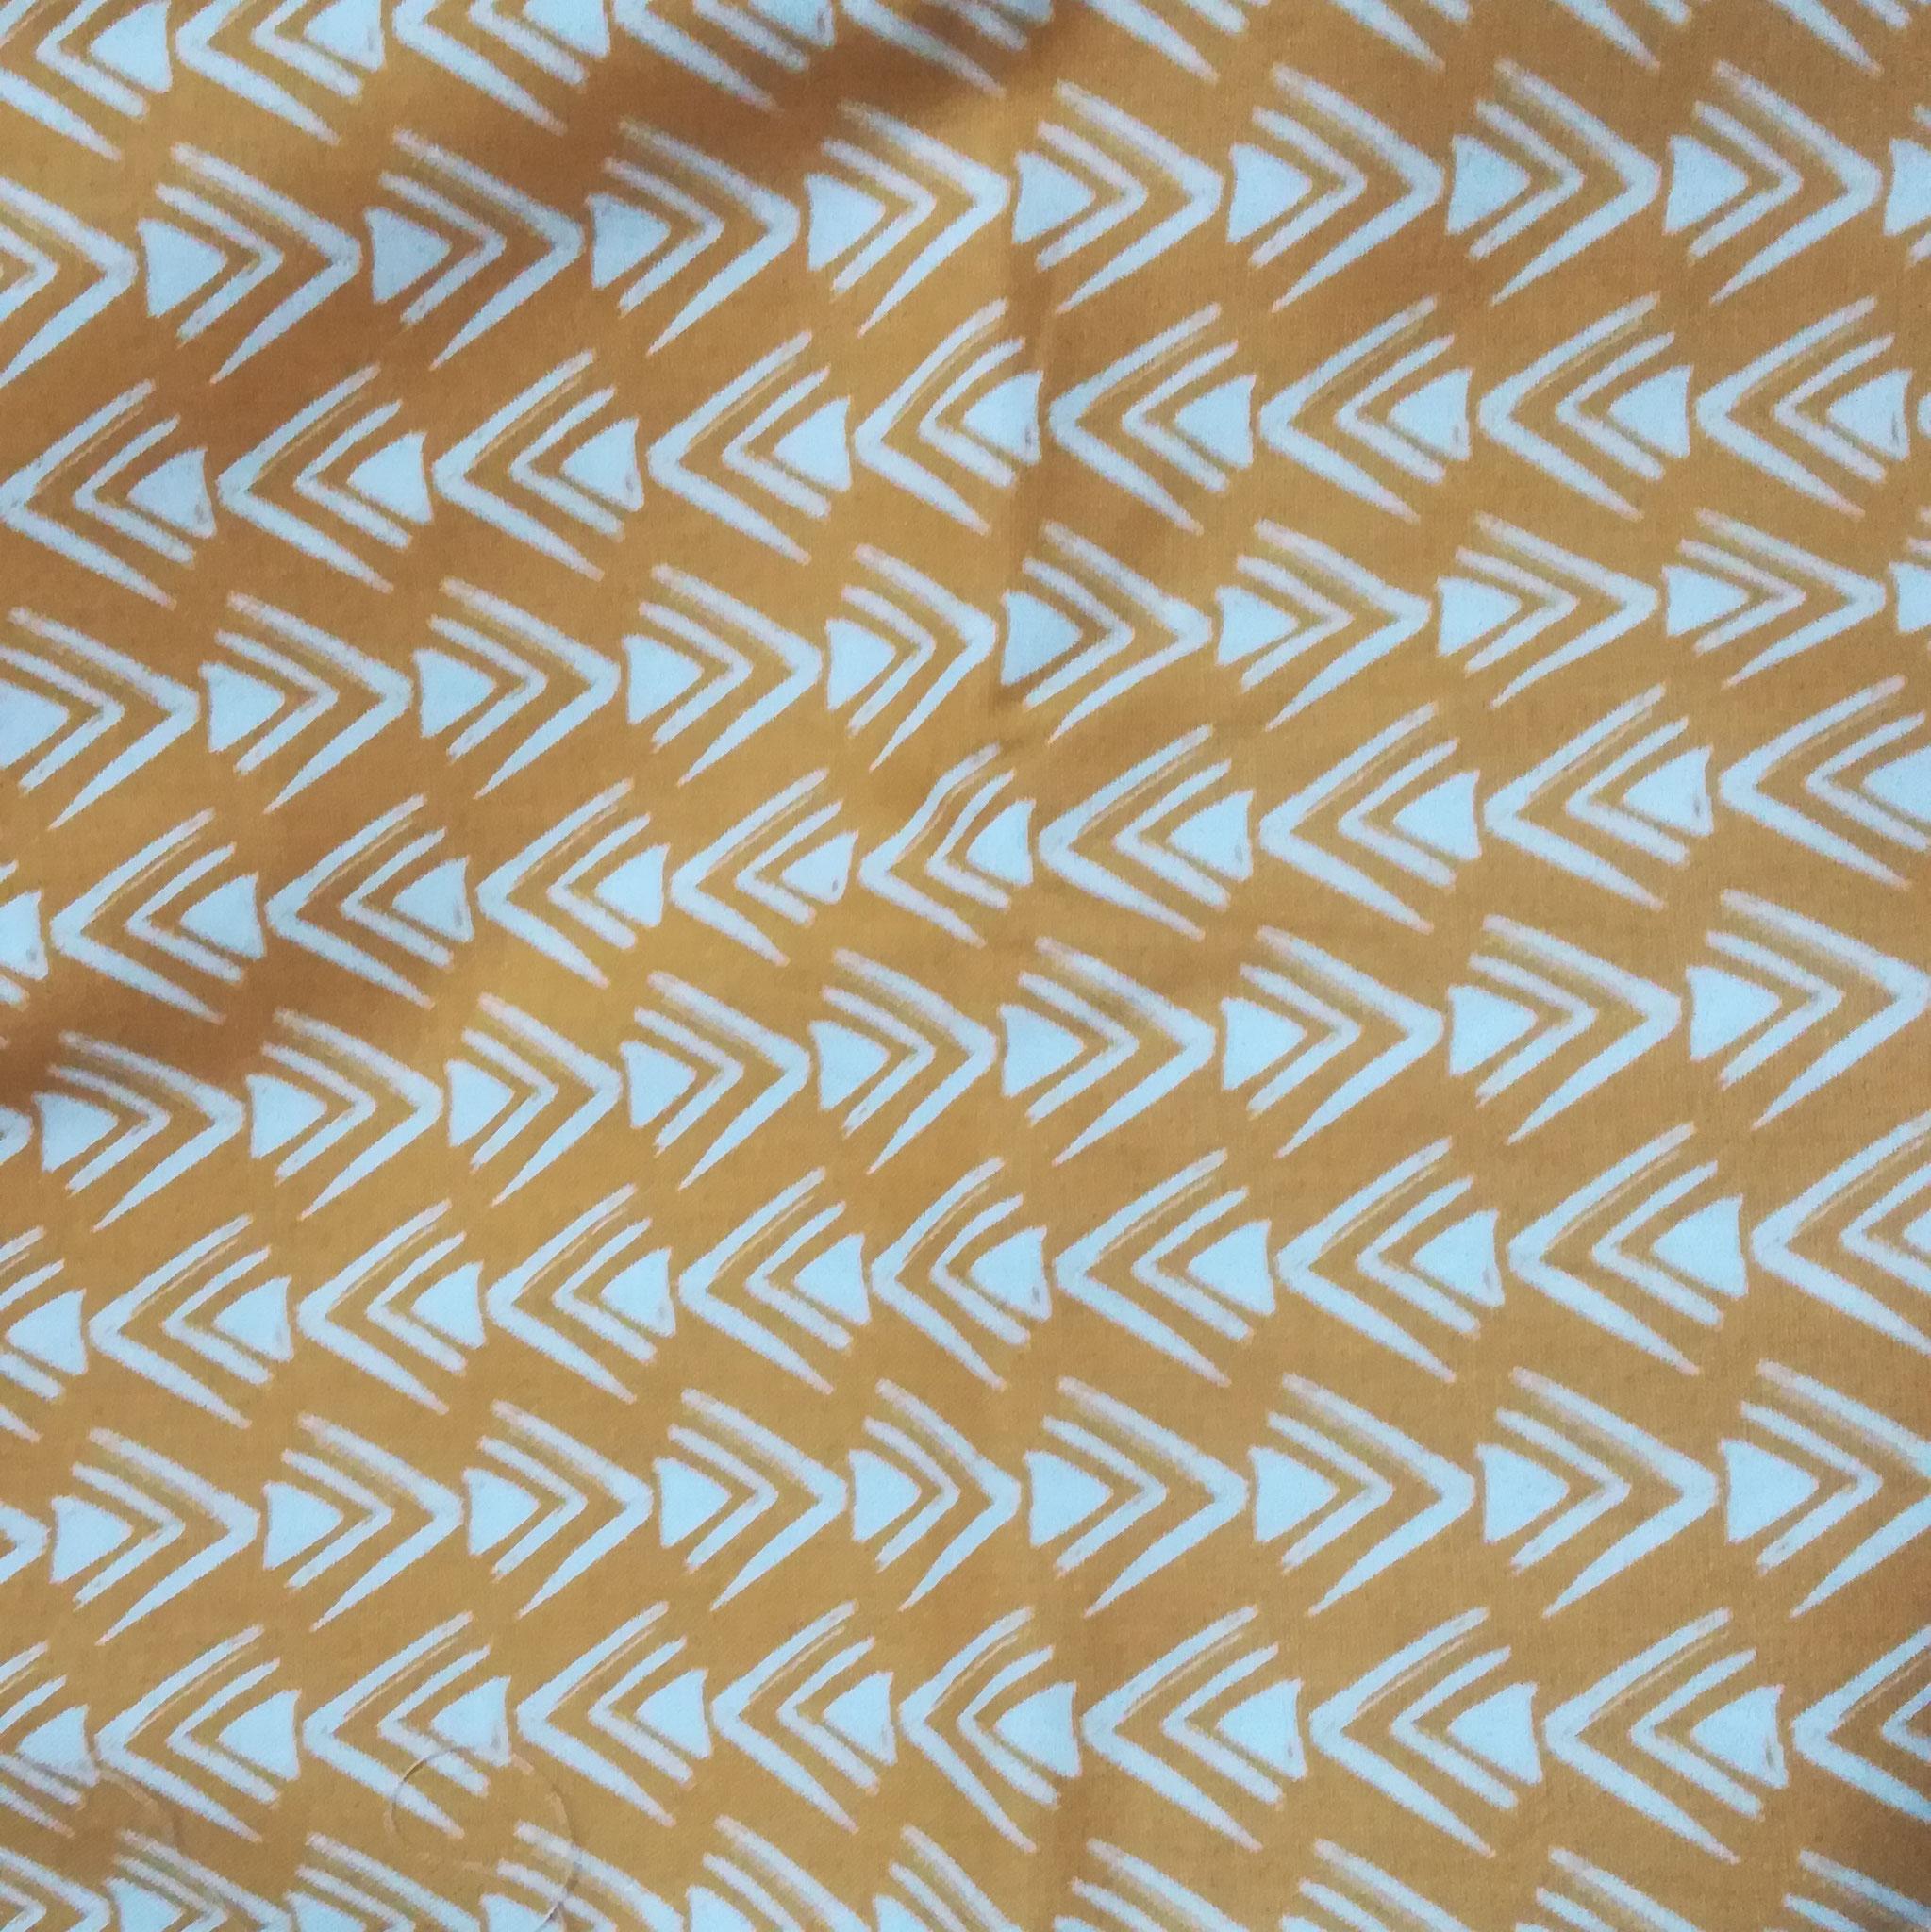 Yellow mustard arrows